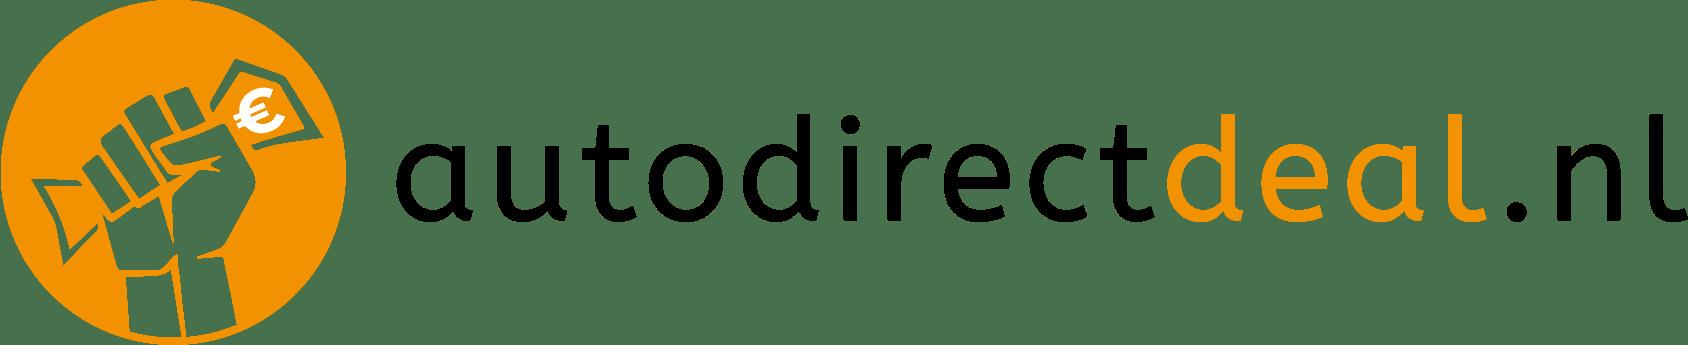 autodirectdeal logo